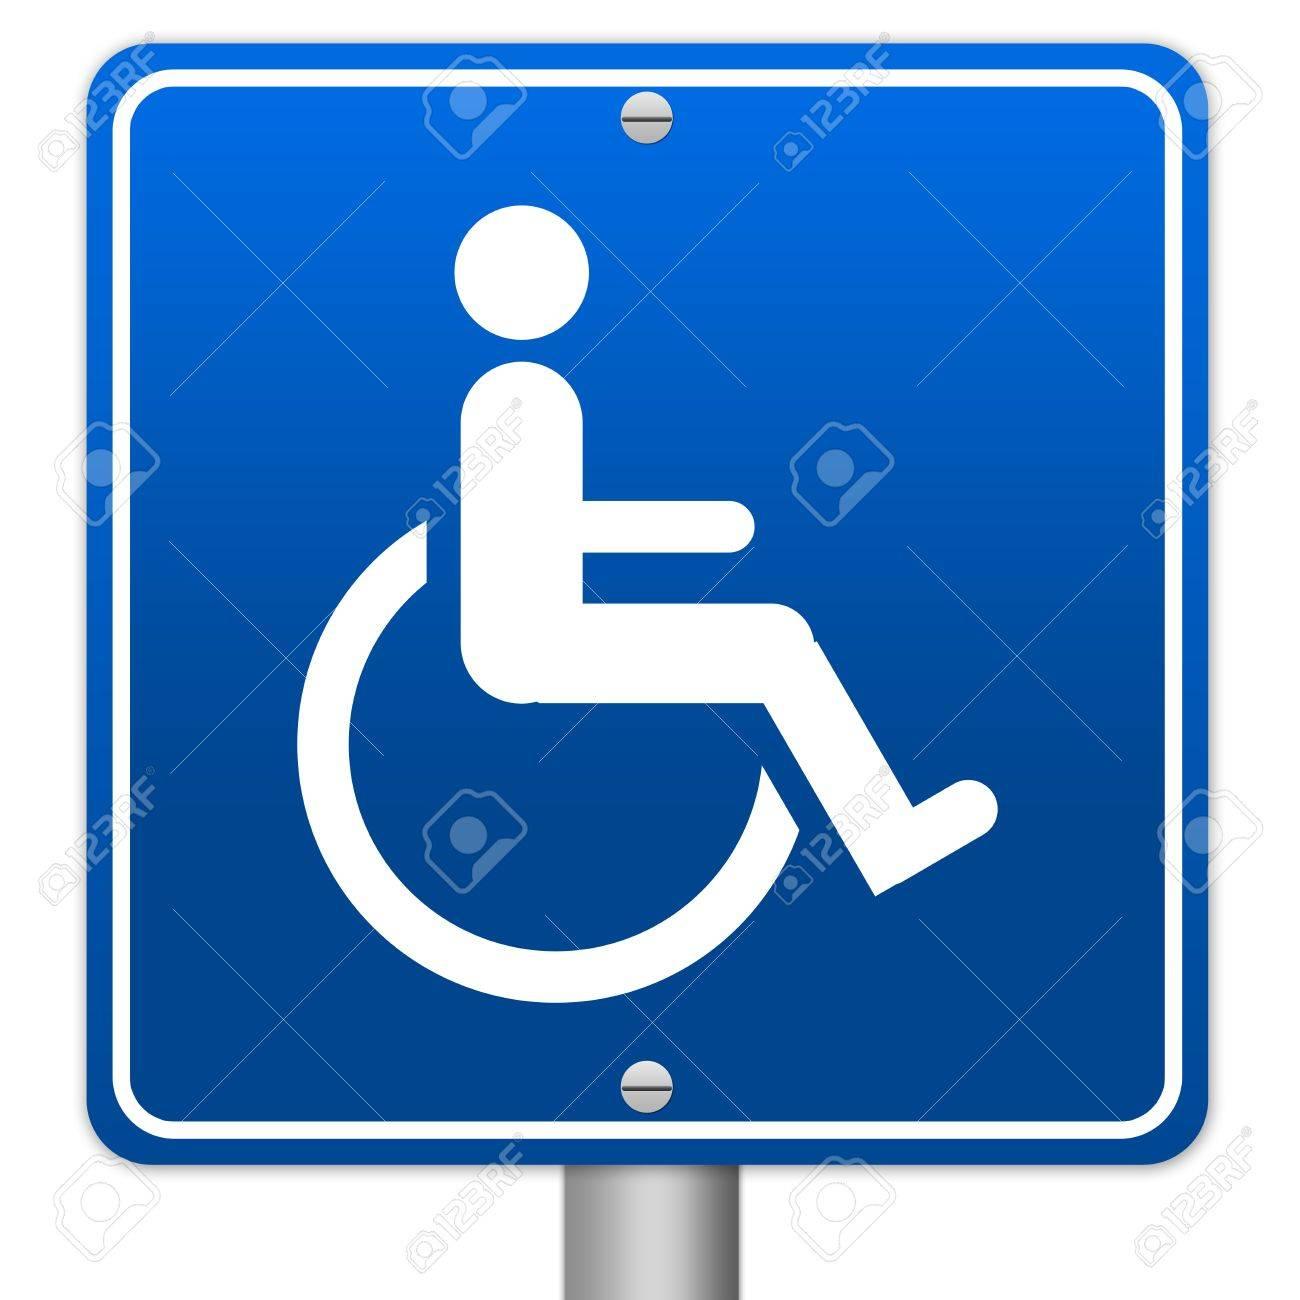 blue square wheelchair handicap